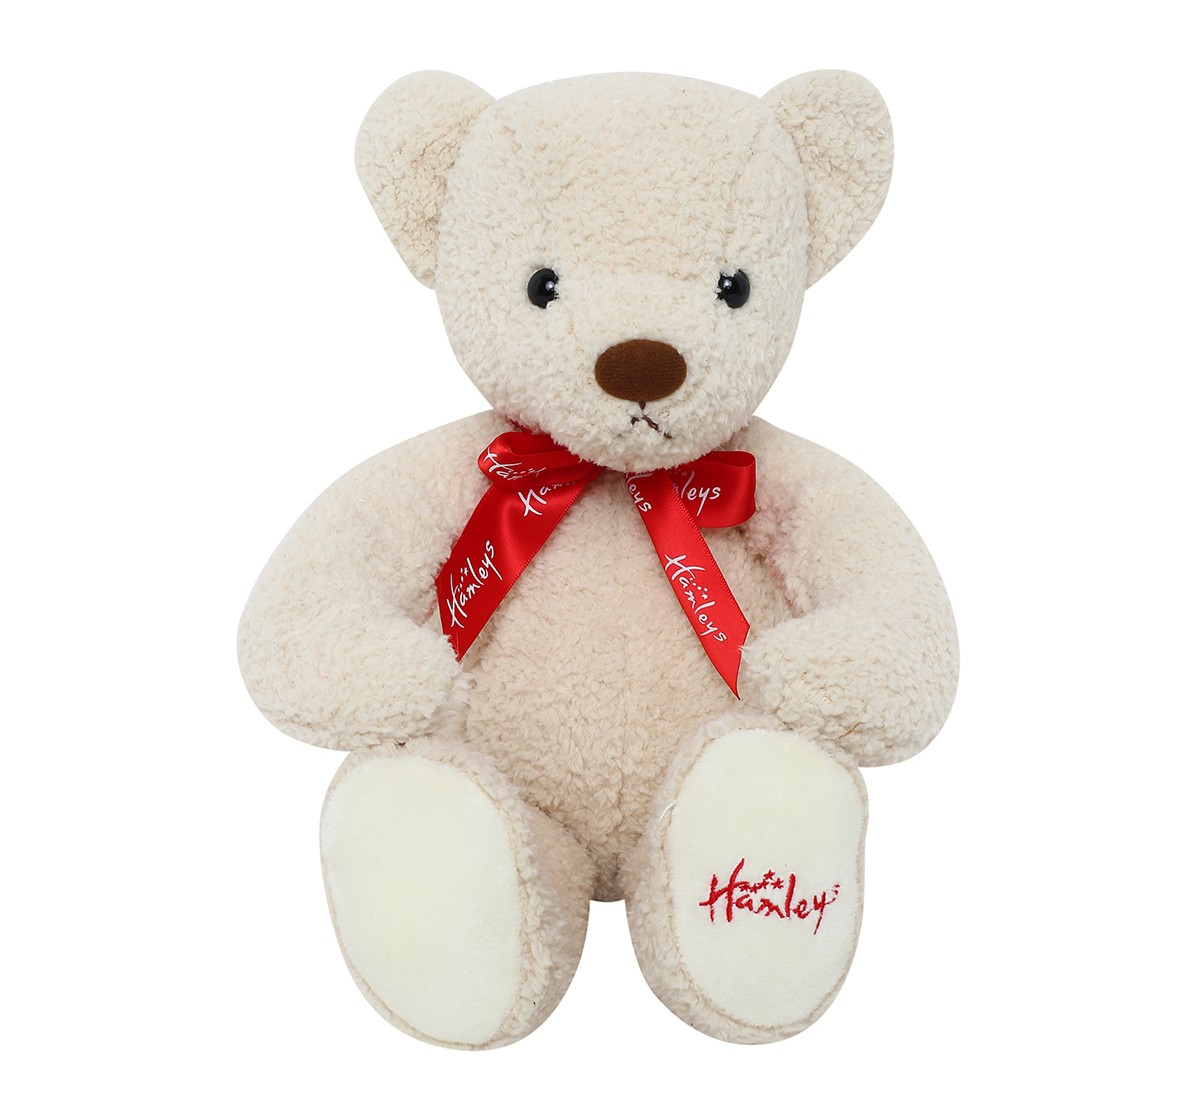 Hamleys Bear Vanilla Teddy Bears for Kids age 3Y+ - 41 Cm (White)